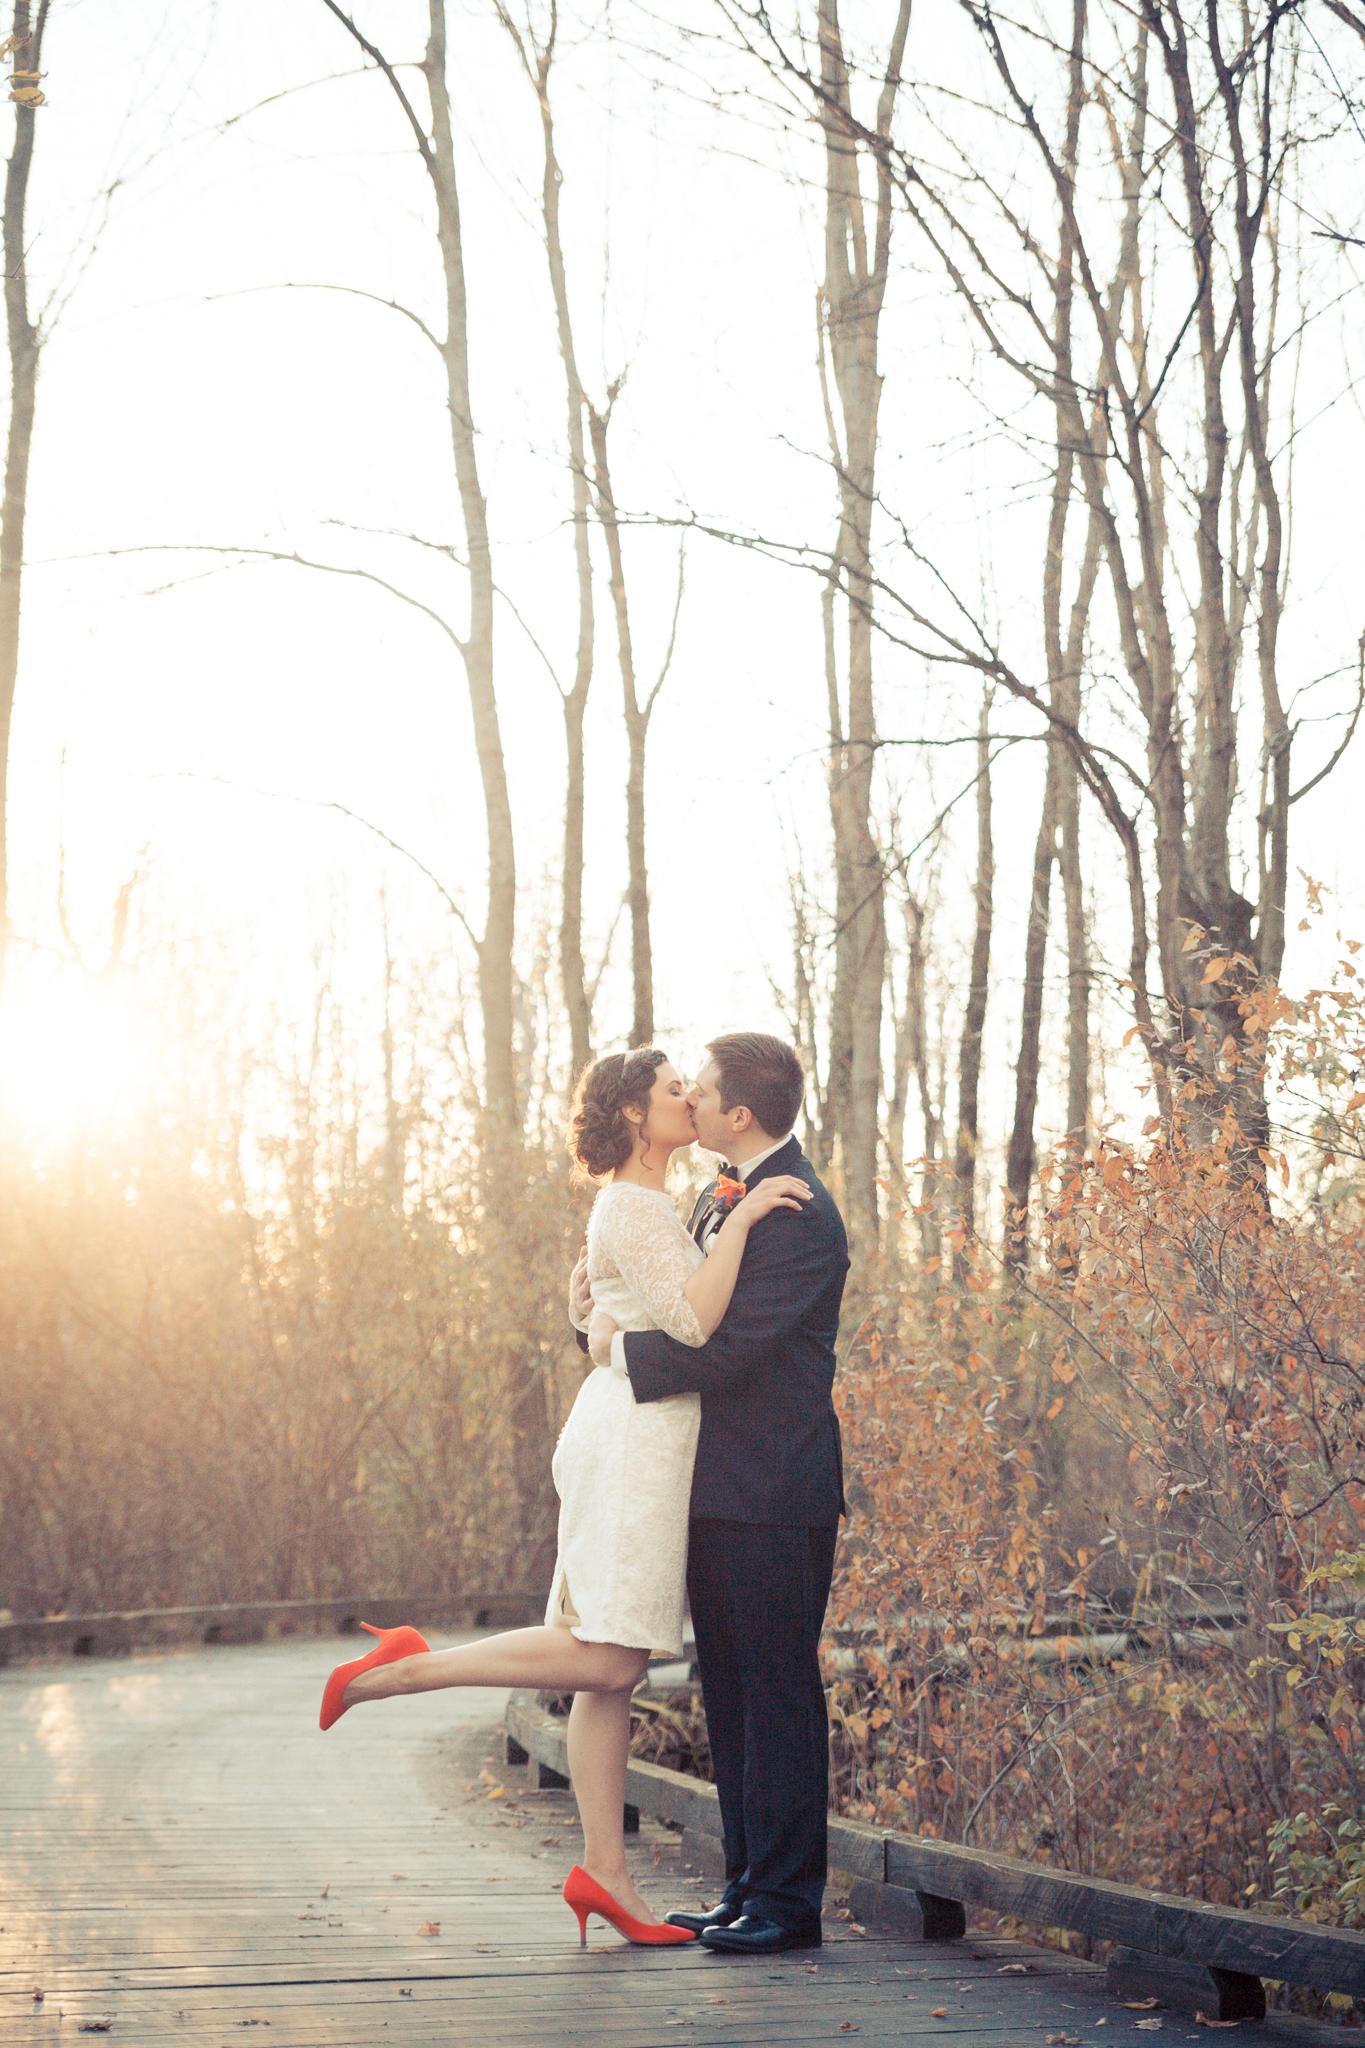 camuglia-whomstudio-chelsea_and_andy-nycphotographer-wedding-brooklyn-buffalo-timberlodge-060-0470.jpg